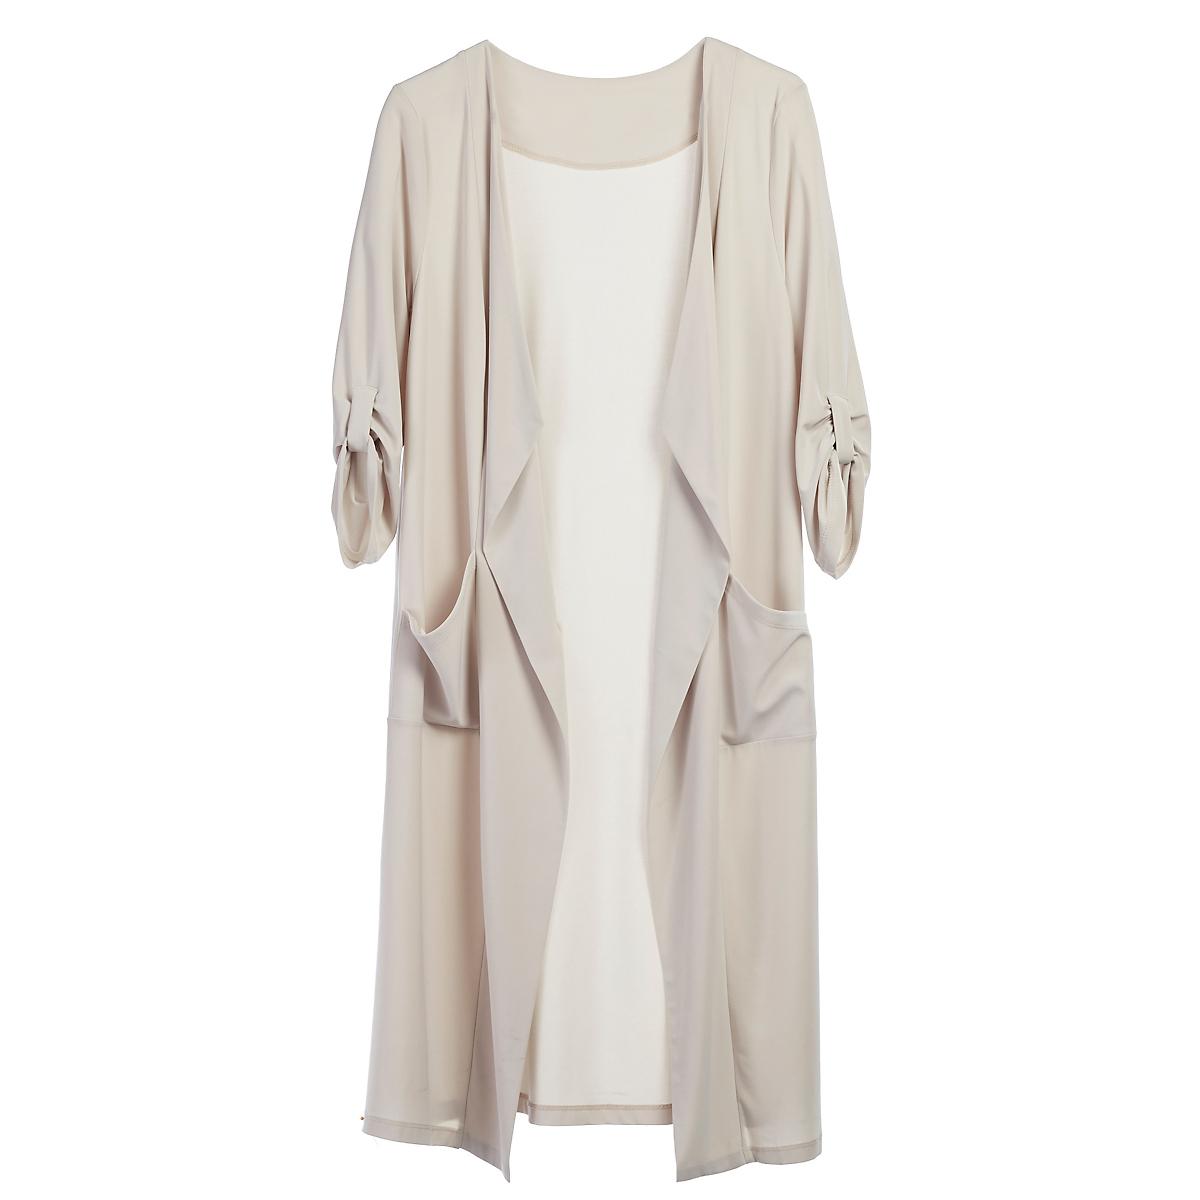 product sale coat front black call draped life type us hmprod m details jacket url size source set h drapes